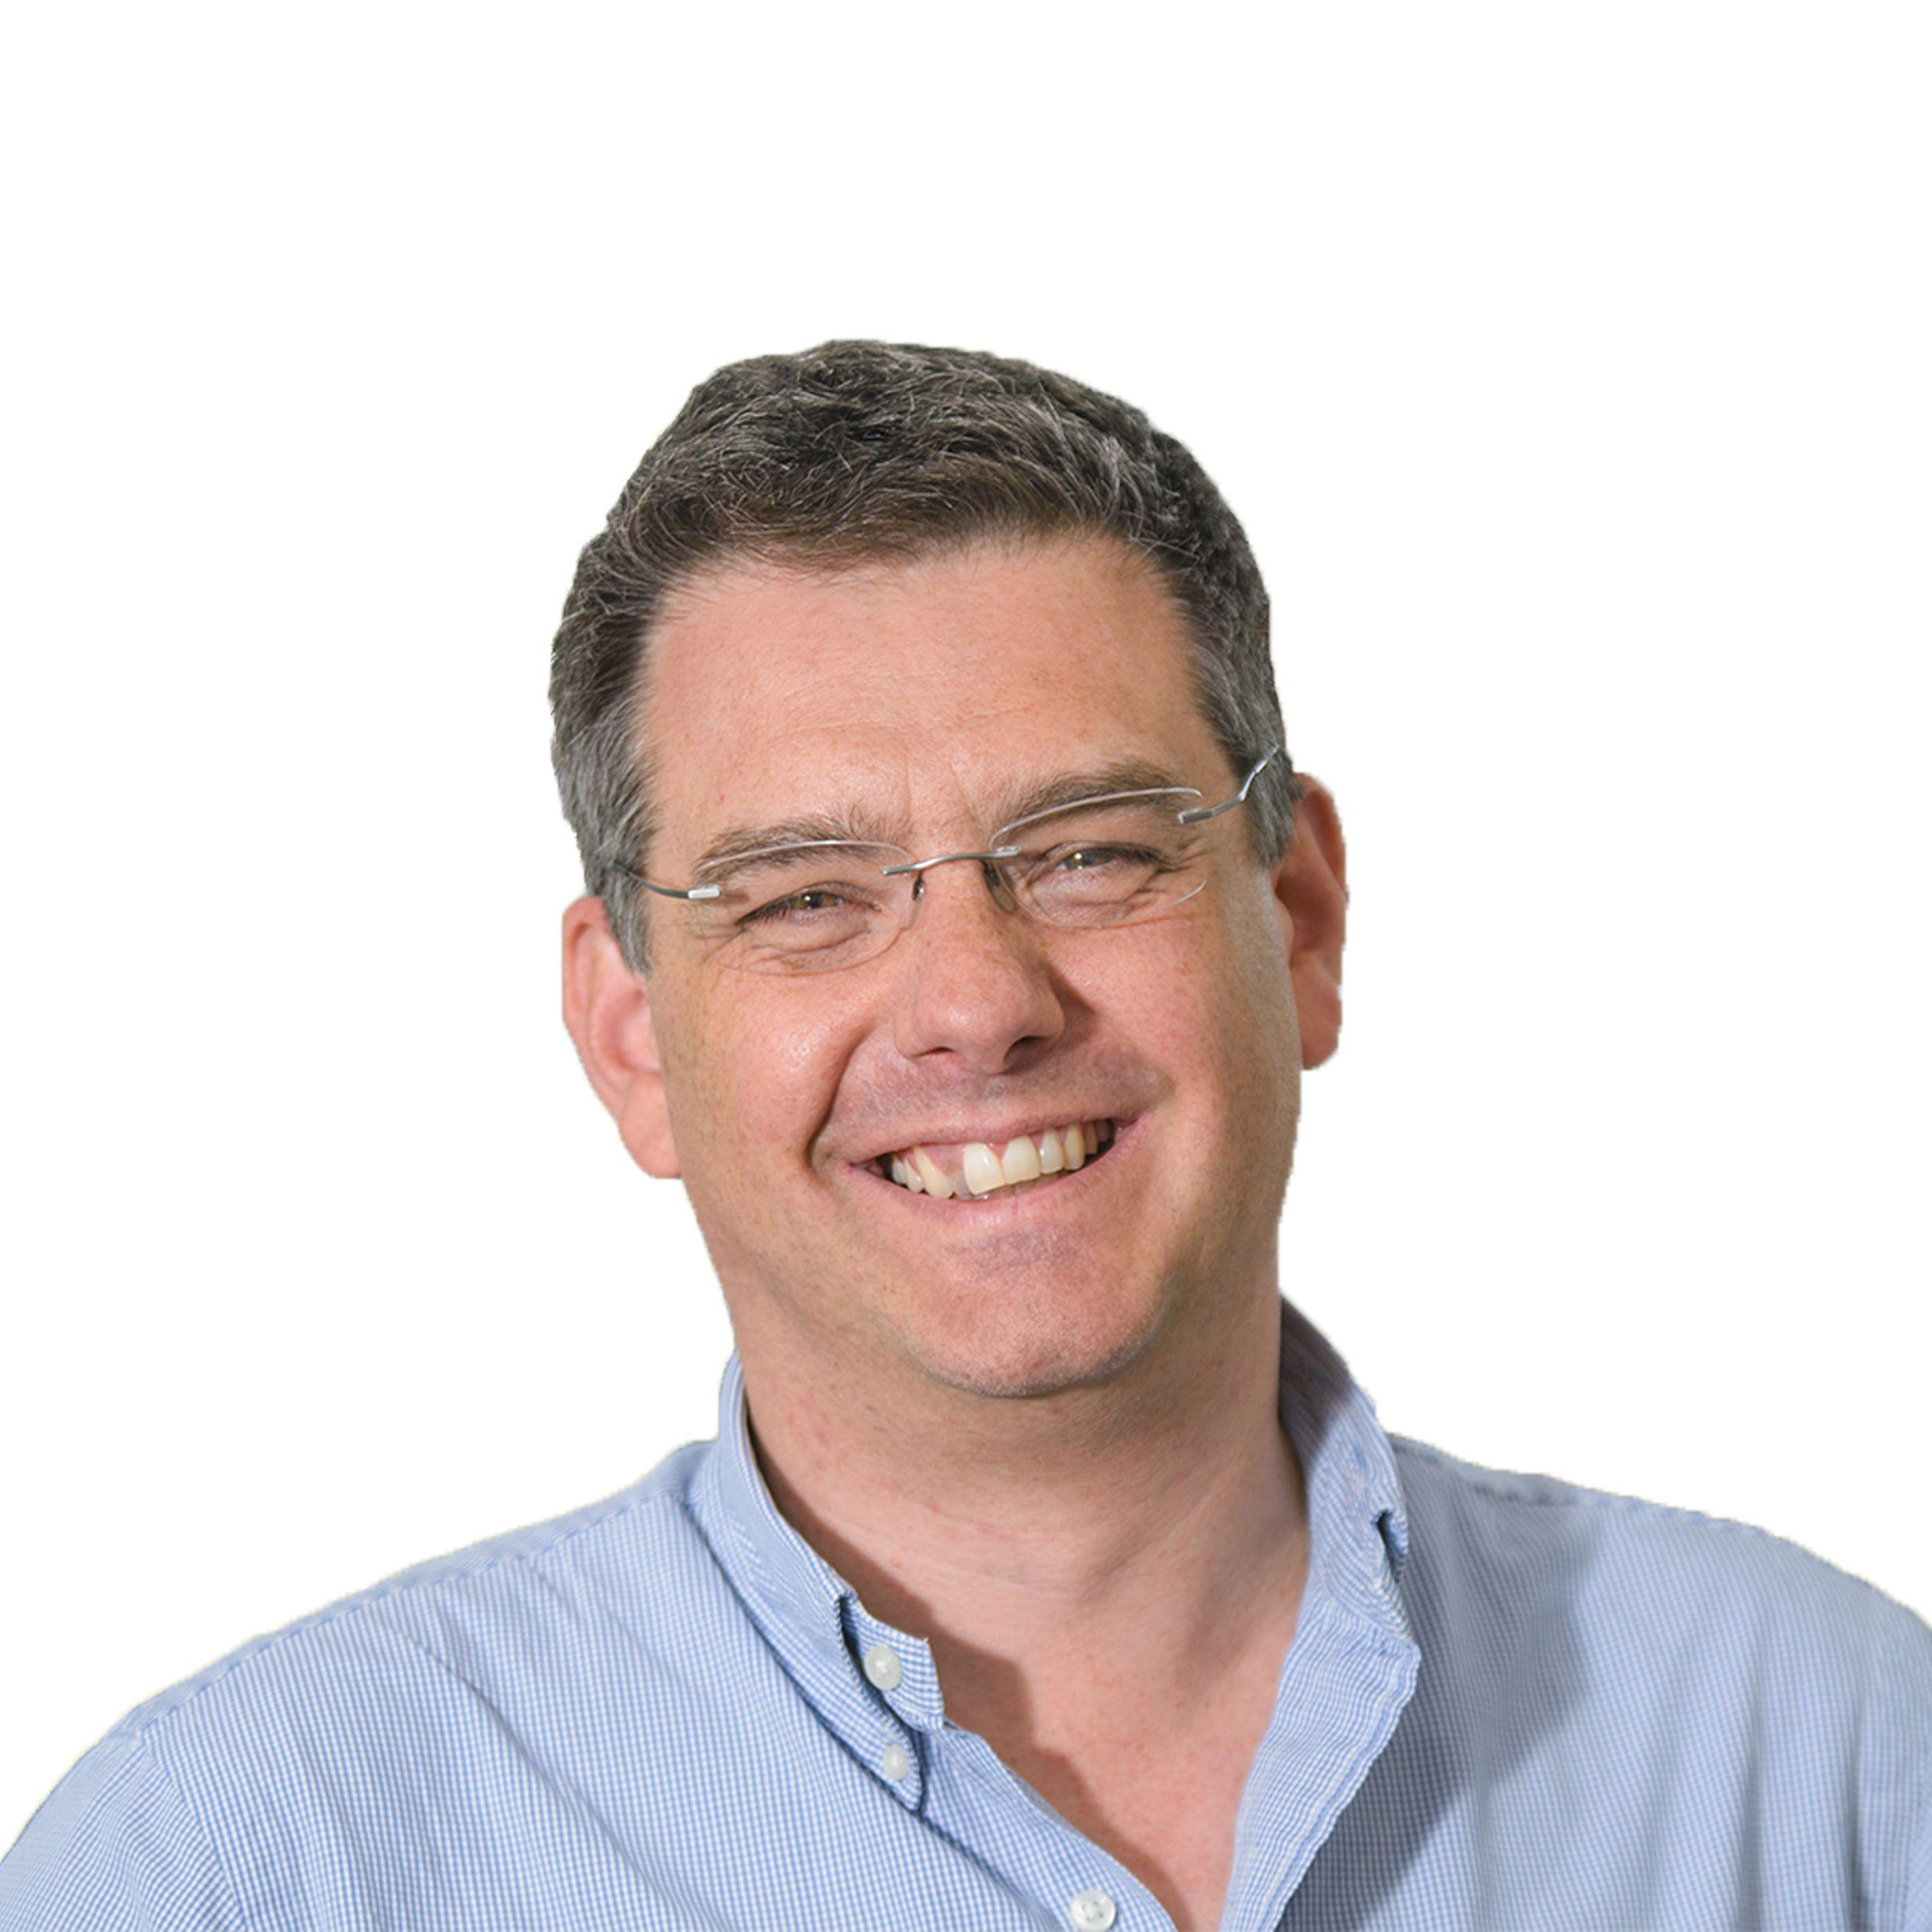 Profile photo of Mark Brooker, Non-Executive Director at Future